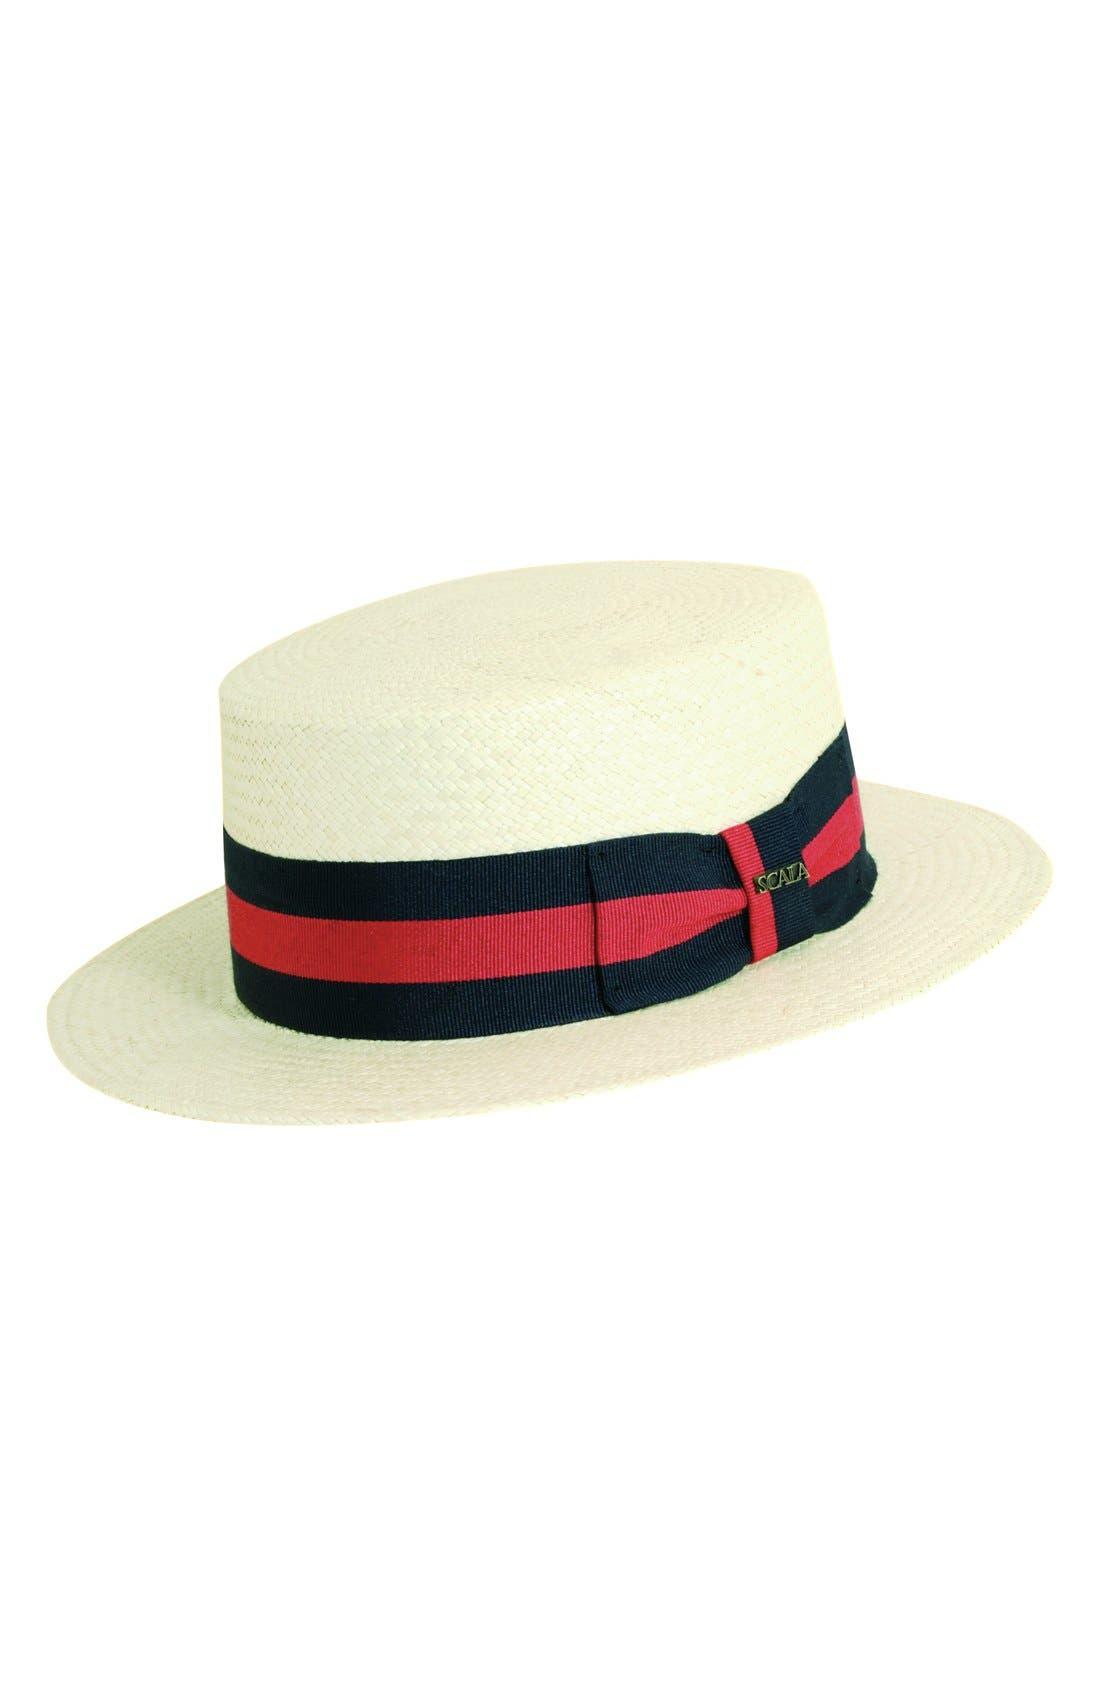 Panama Straw Boater Hat,                             Main thumbnail 1, color,                             109